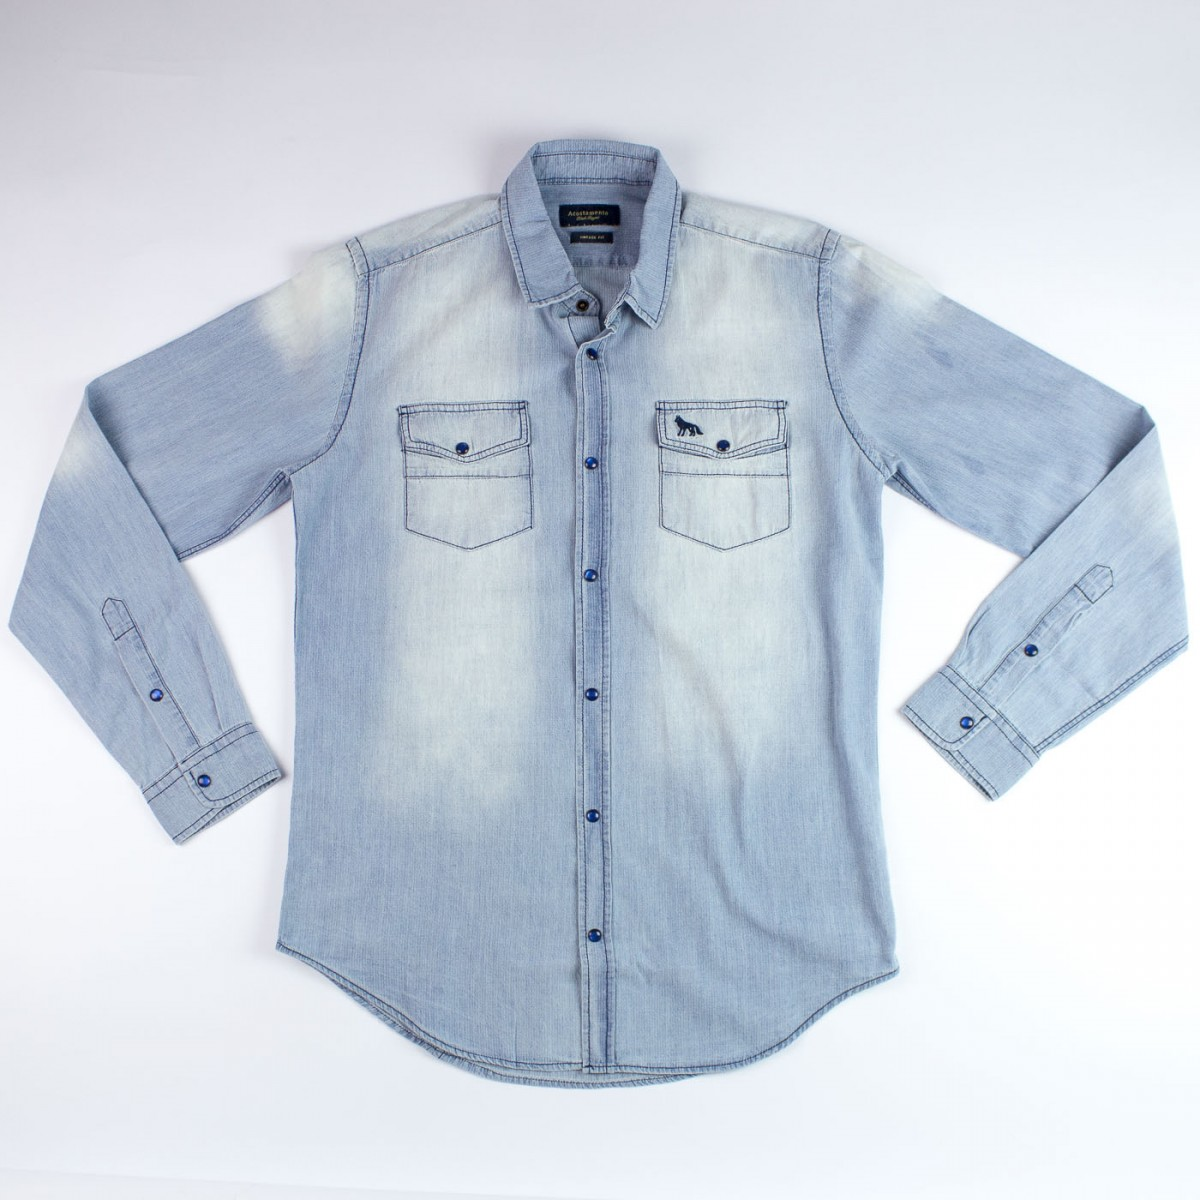 47957140b3bfc Bizz Store - Camisa Social Jeans Acostamento Masculina Azul